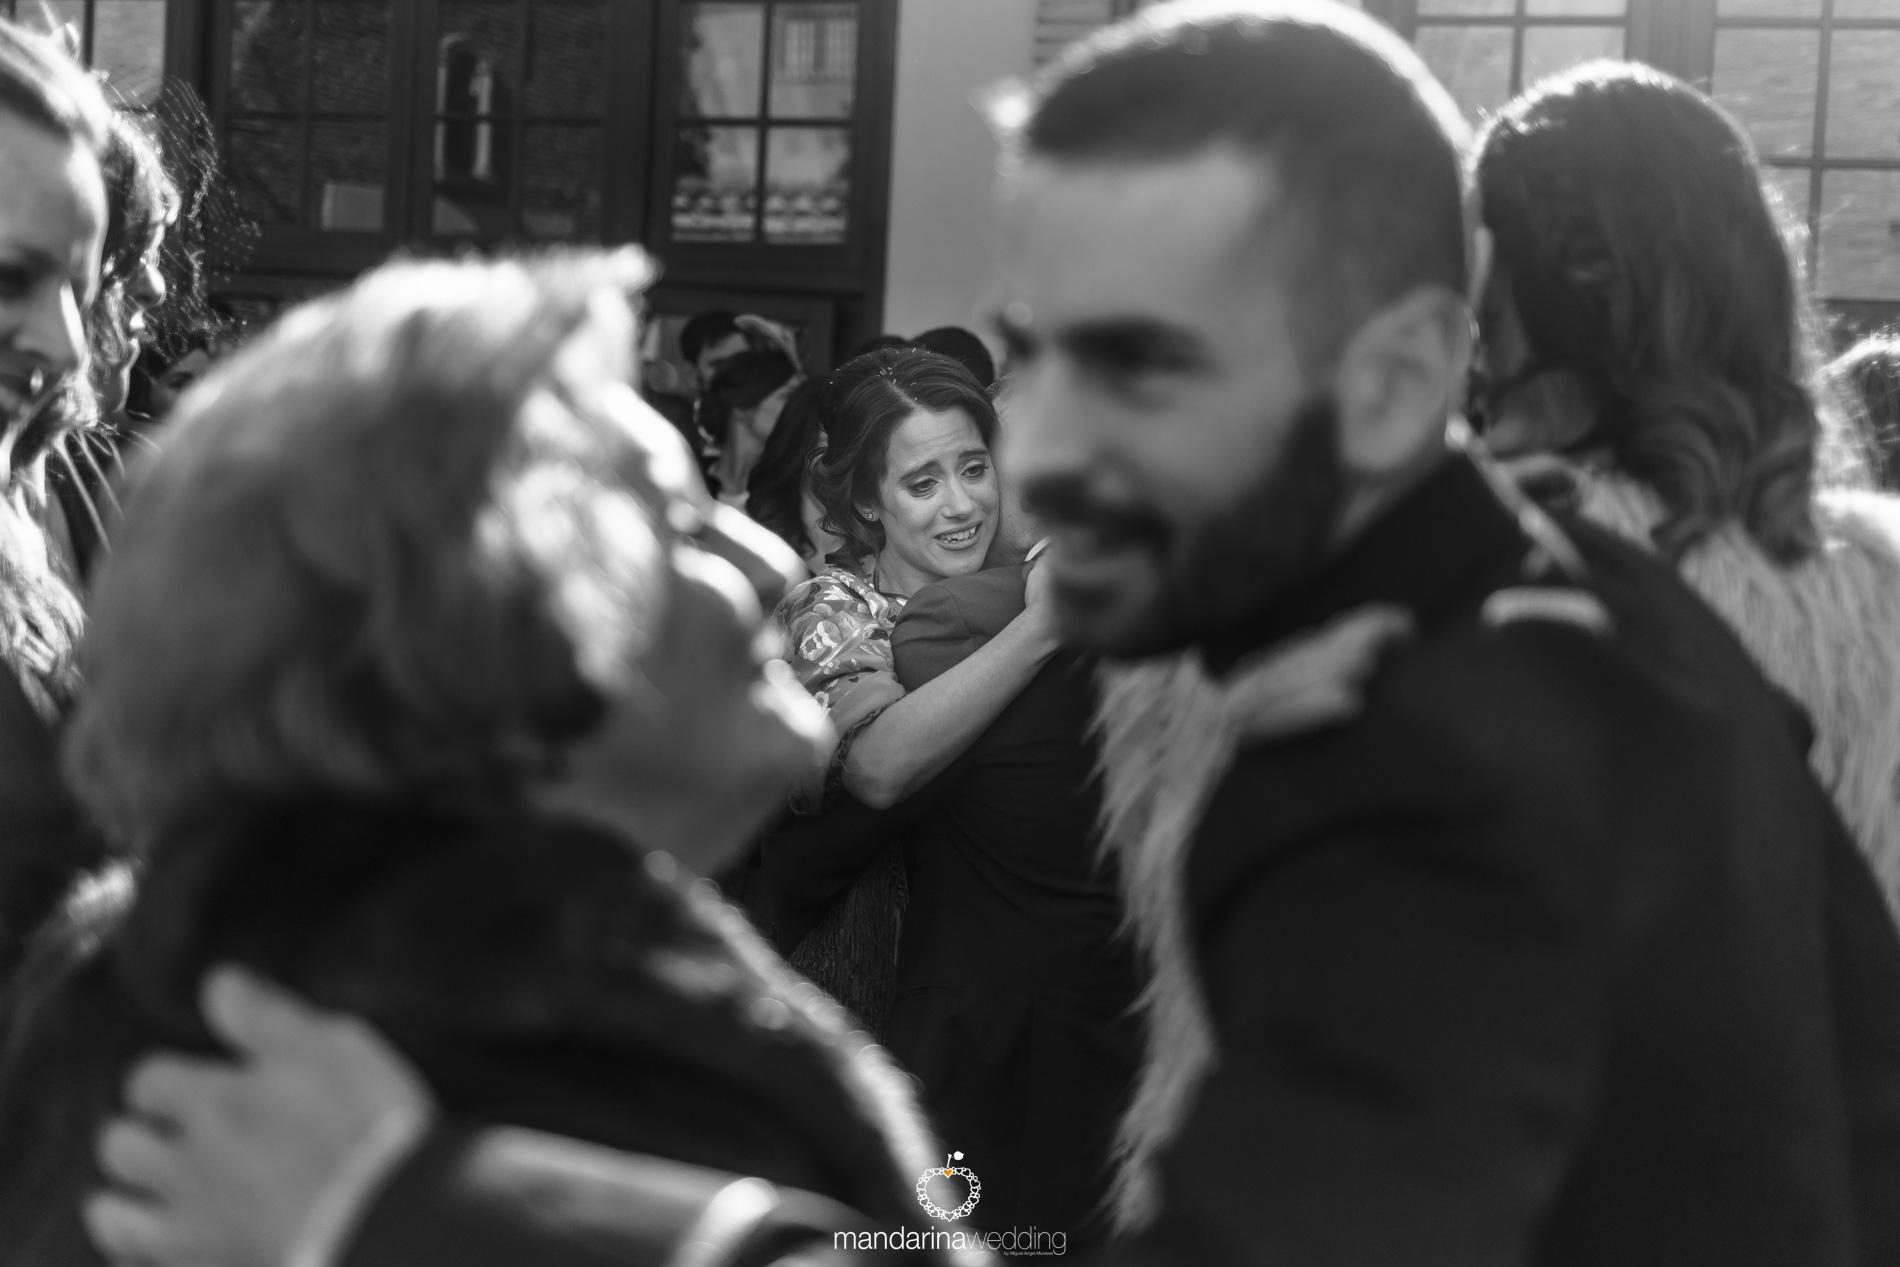 mandarina wedding, fotografos de boda, fotografo boda soria, fotografo boda barcelona, fotografo boda Madrid, fotógrafo boda lerida_15